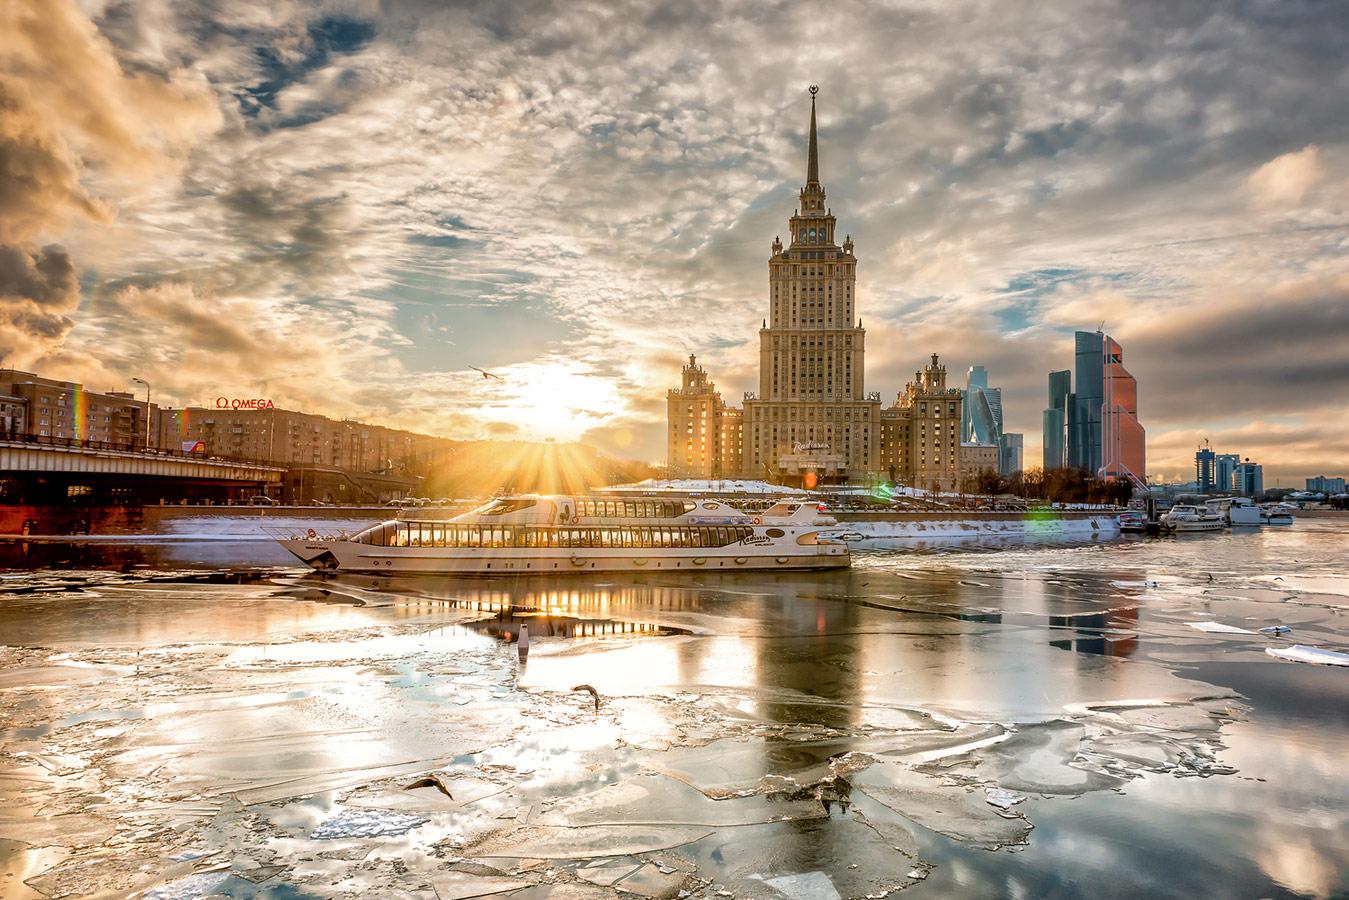 Терехина Юлия / Зимние прогулки, Выбор «ТАСС», Фотоконкурс «Планета Москва»